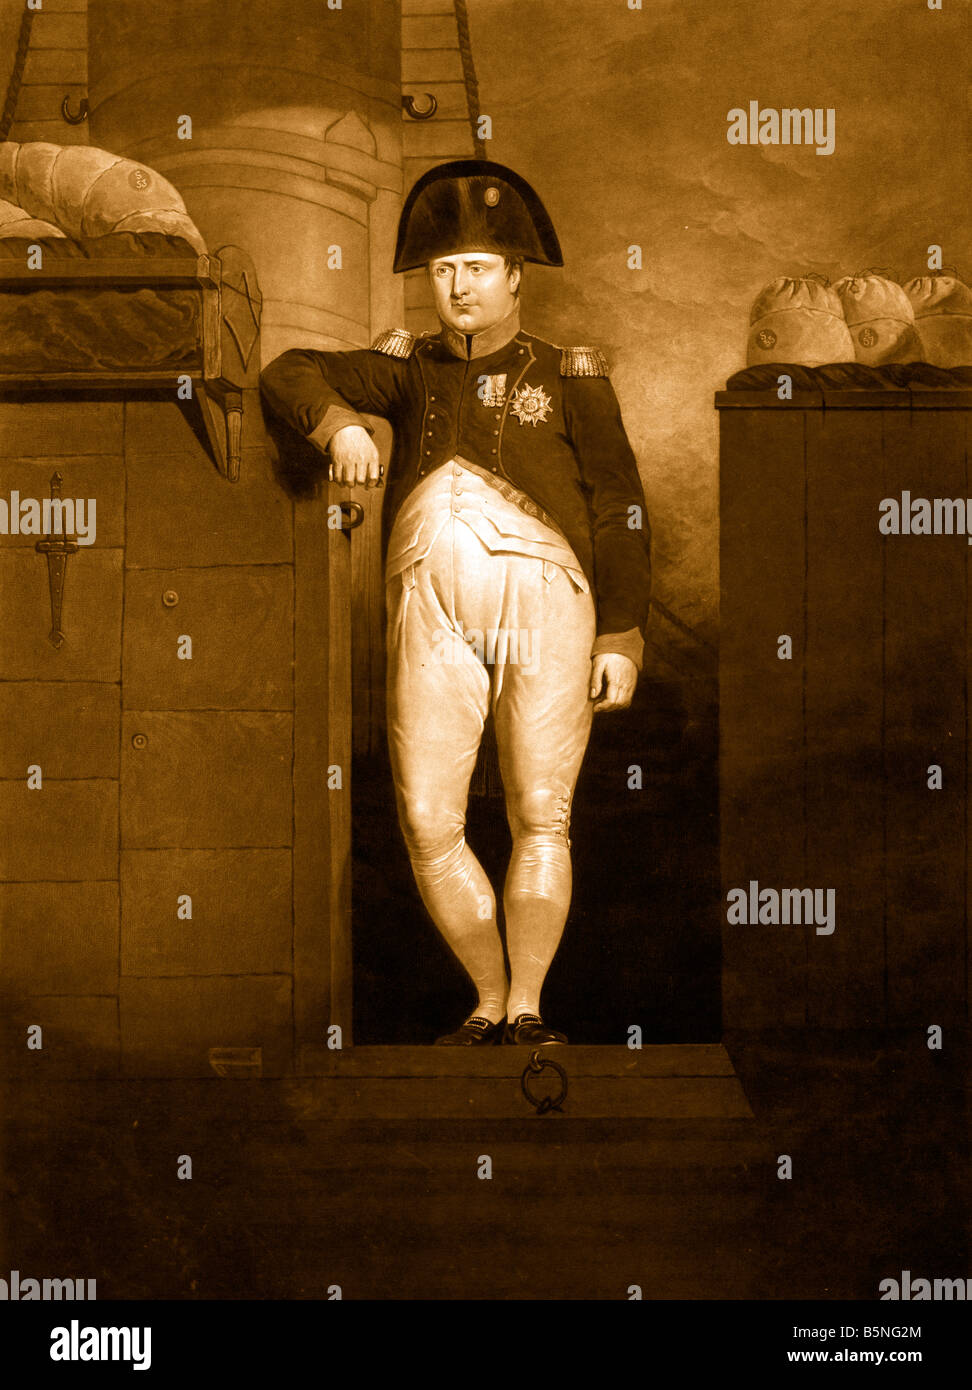 The great Napoleon Bonaparte - Stock Image